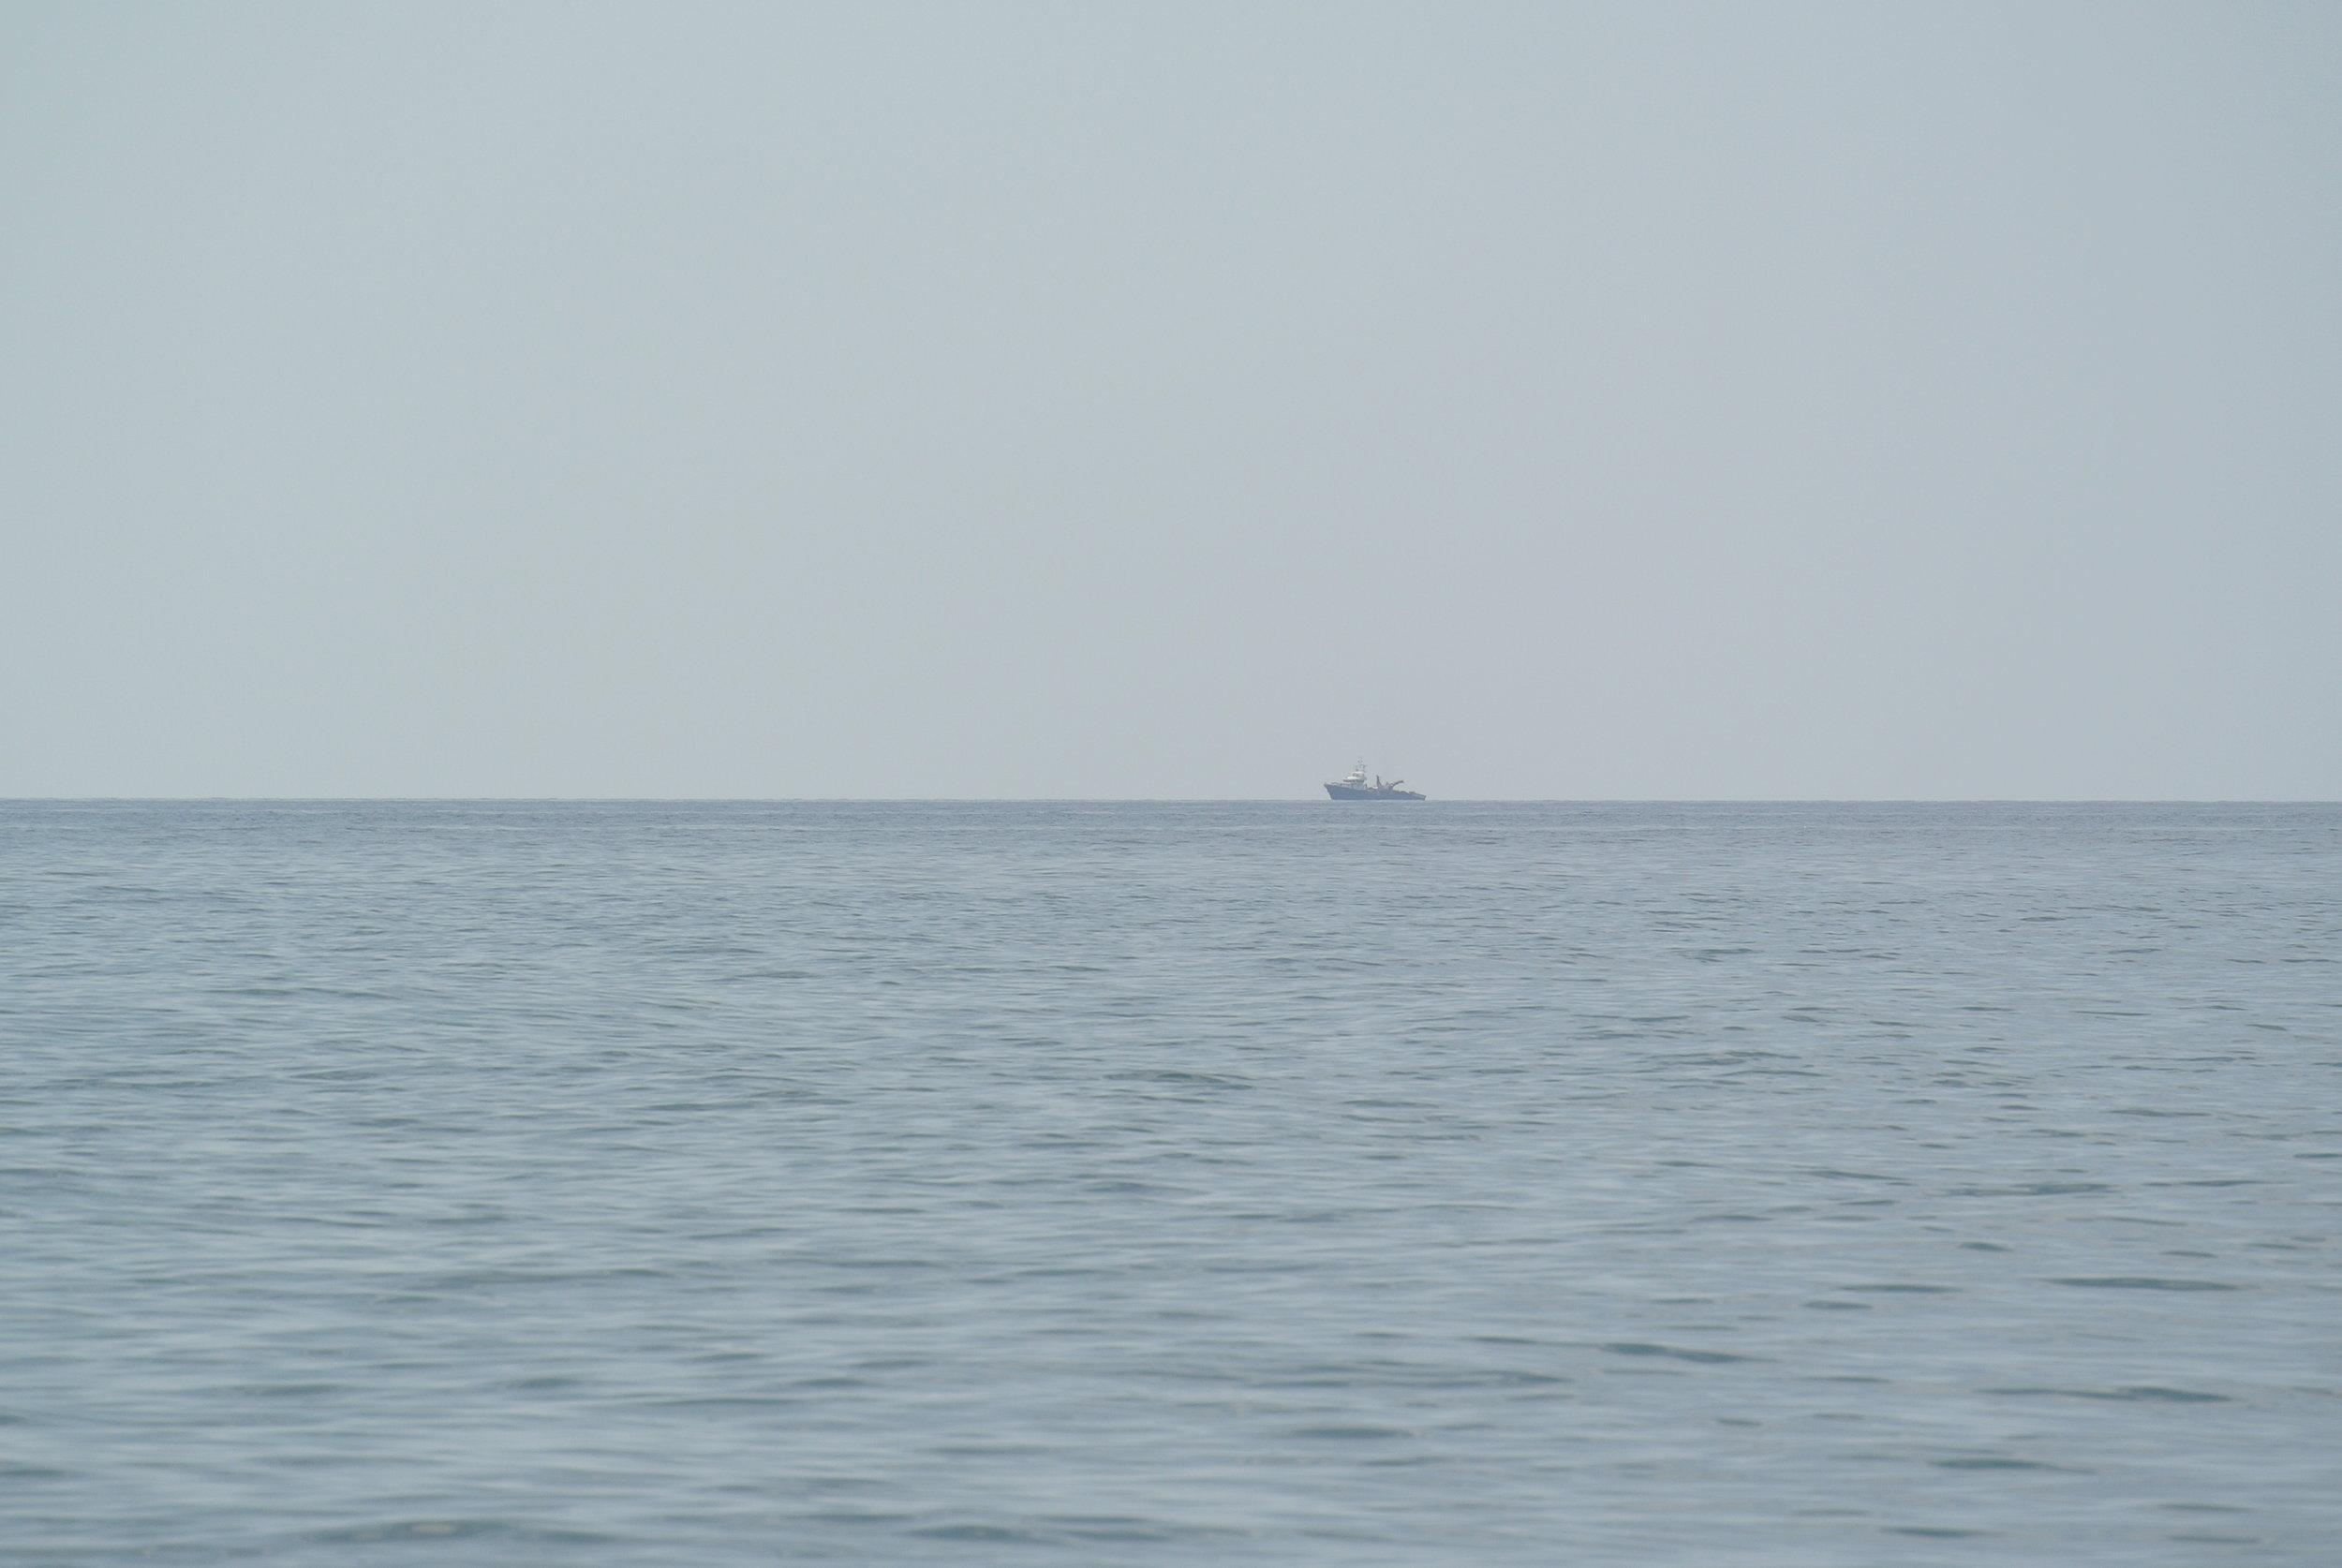 Ships on the horizon resembling rescue vessels. Longobardi, Italia; May 2018. ©Pamela Kerpius